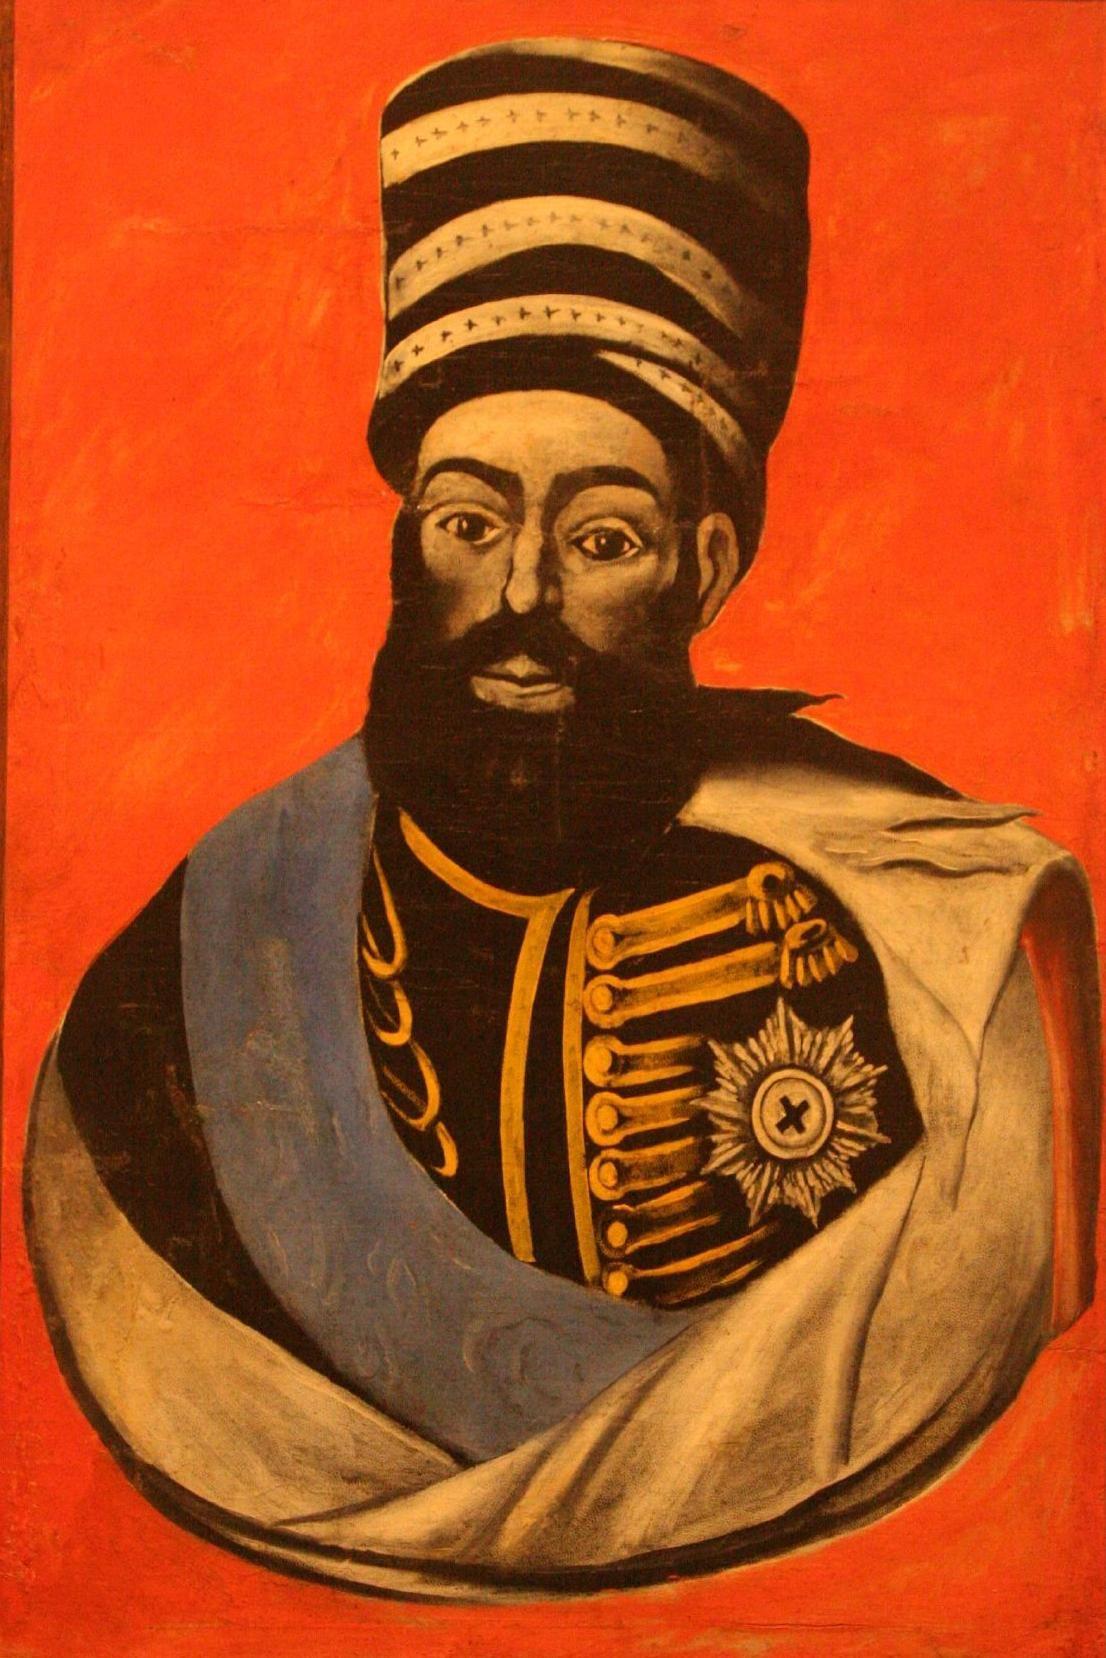 Niko Pirosmani (May 5, 1862 - April 9, 1918): Georgian primitivist painter.